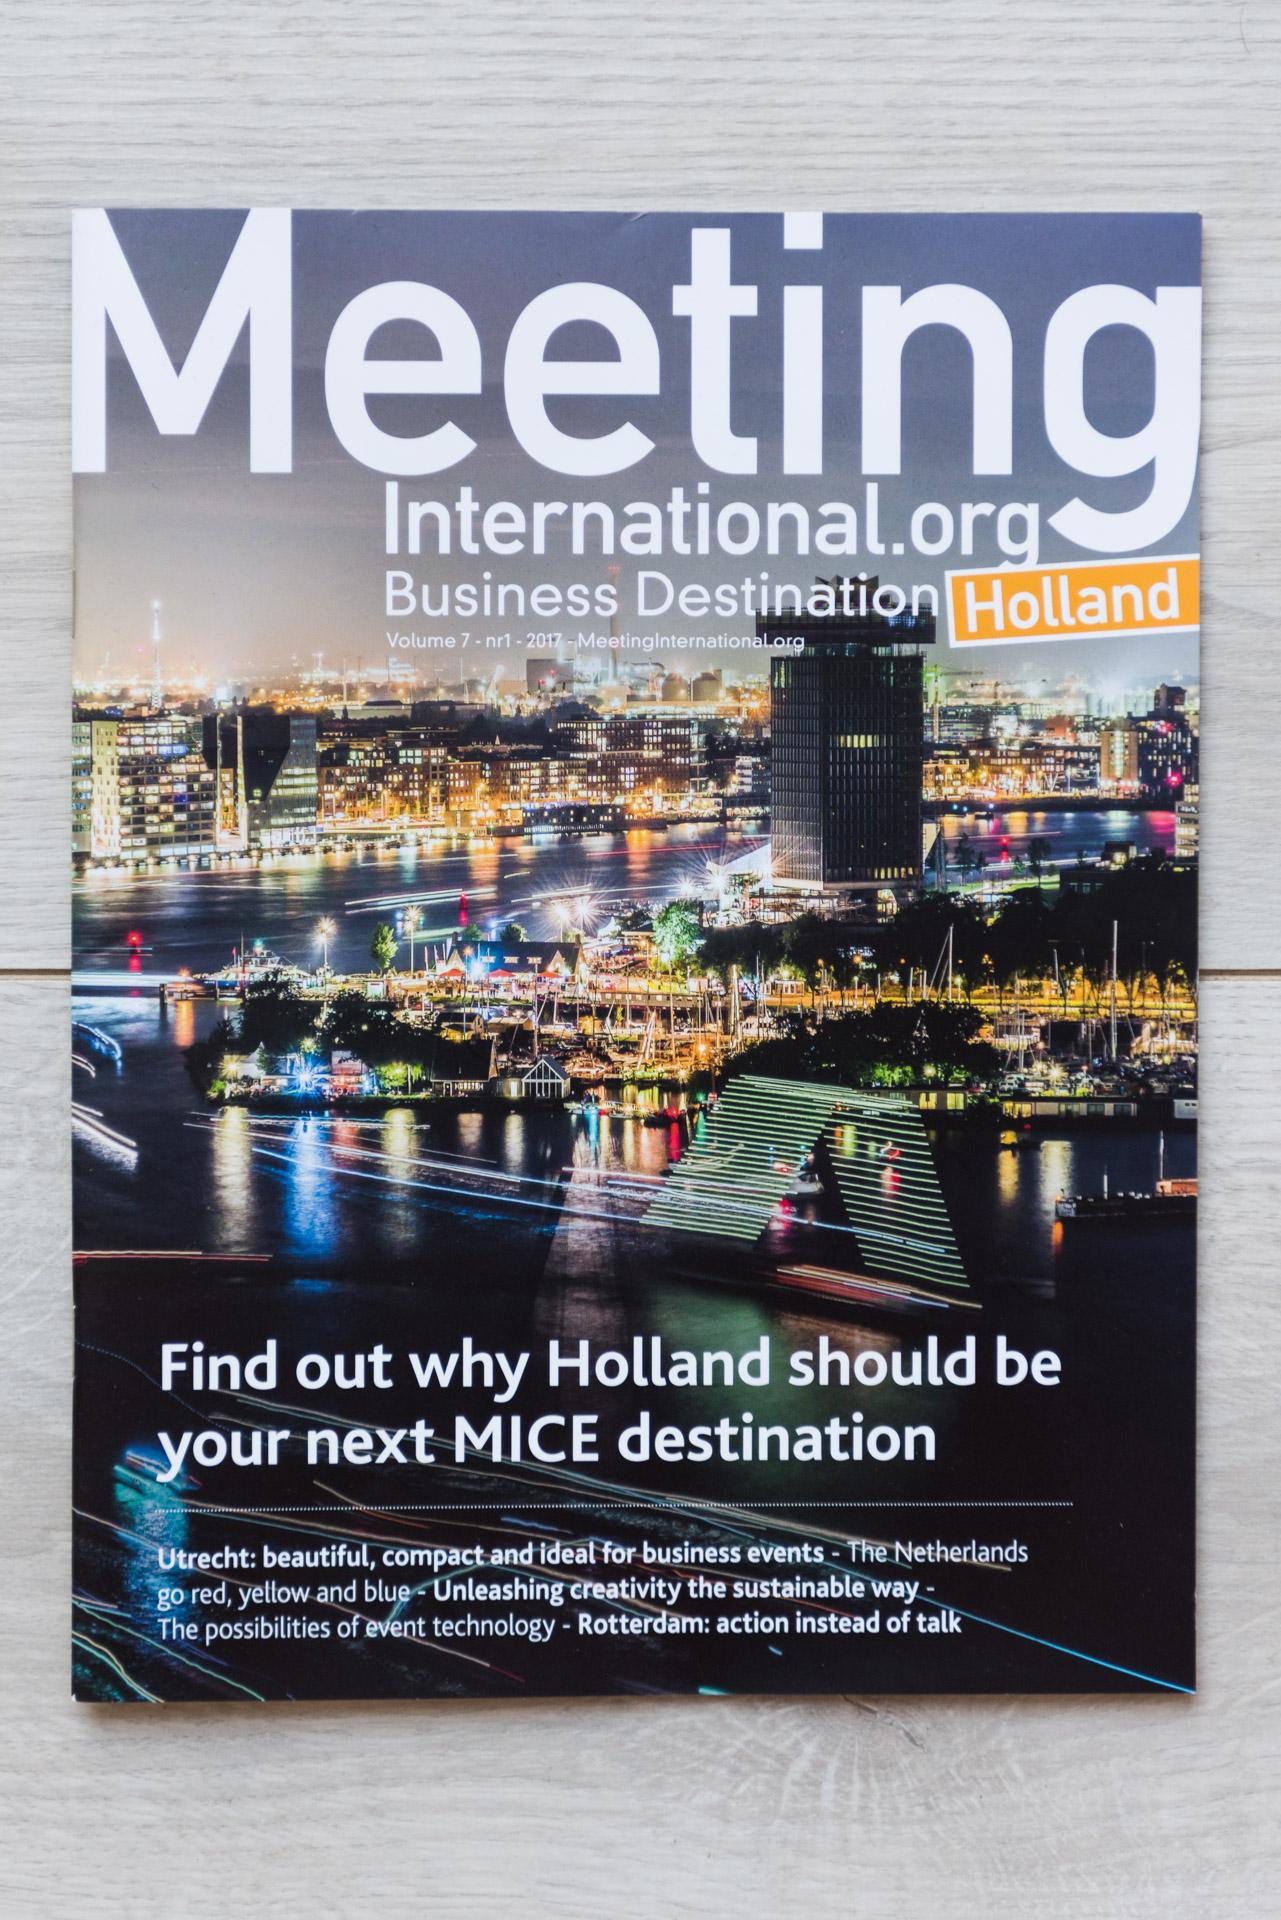 Meeting magazine cover